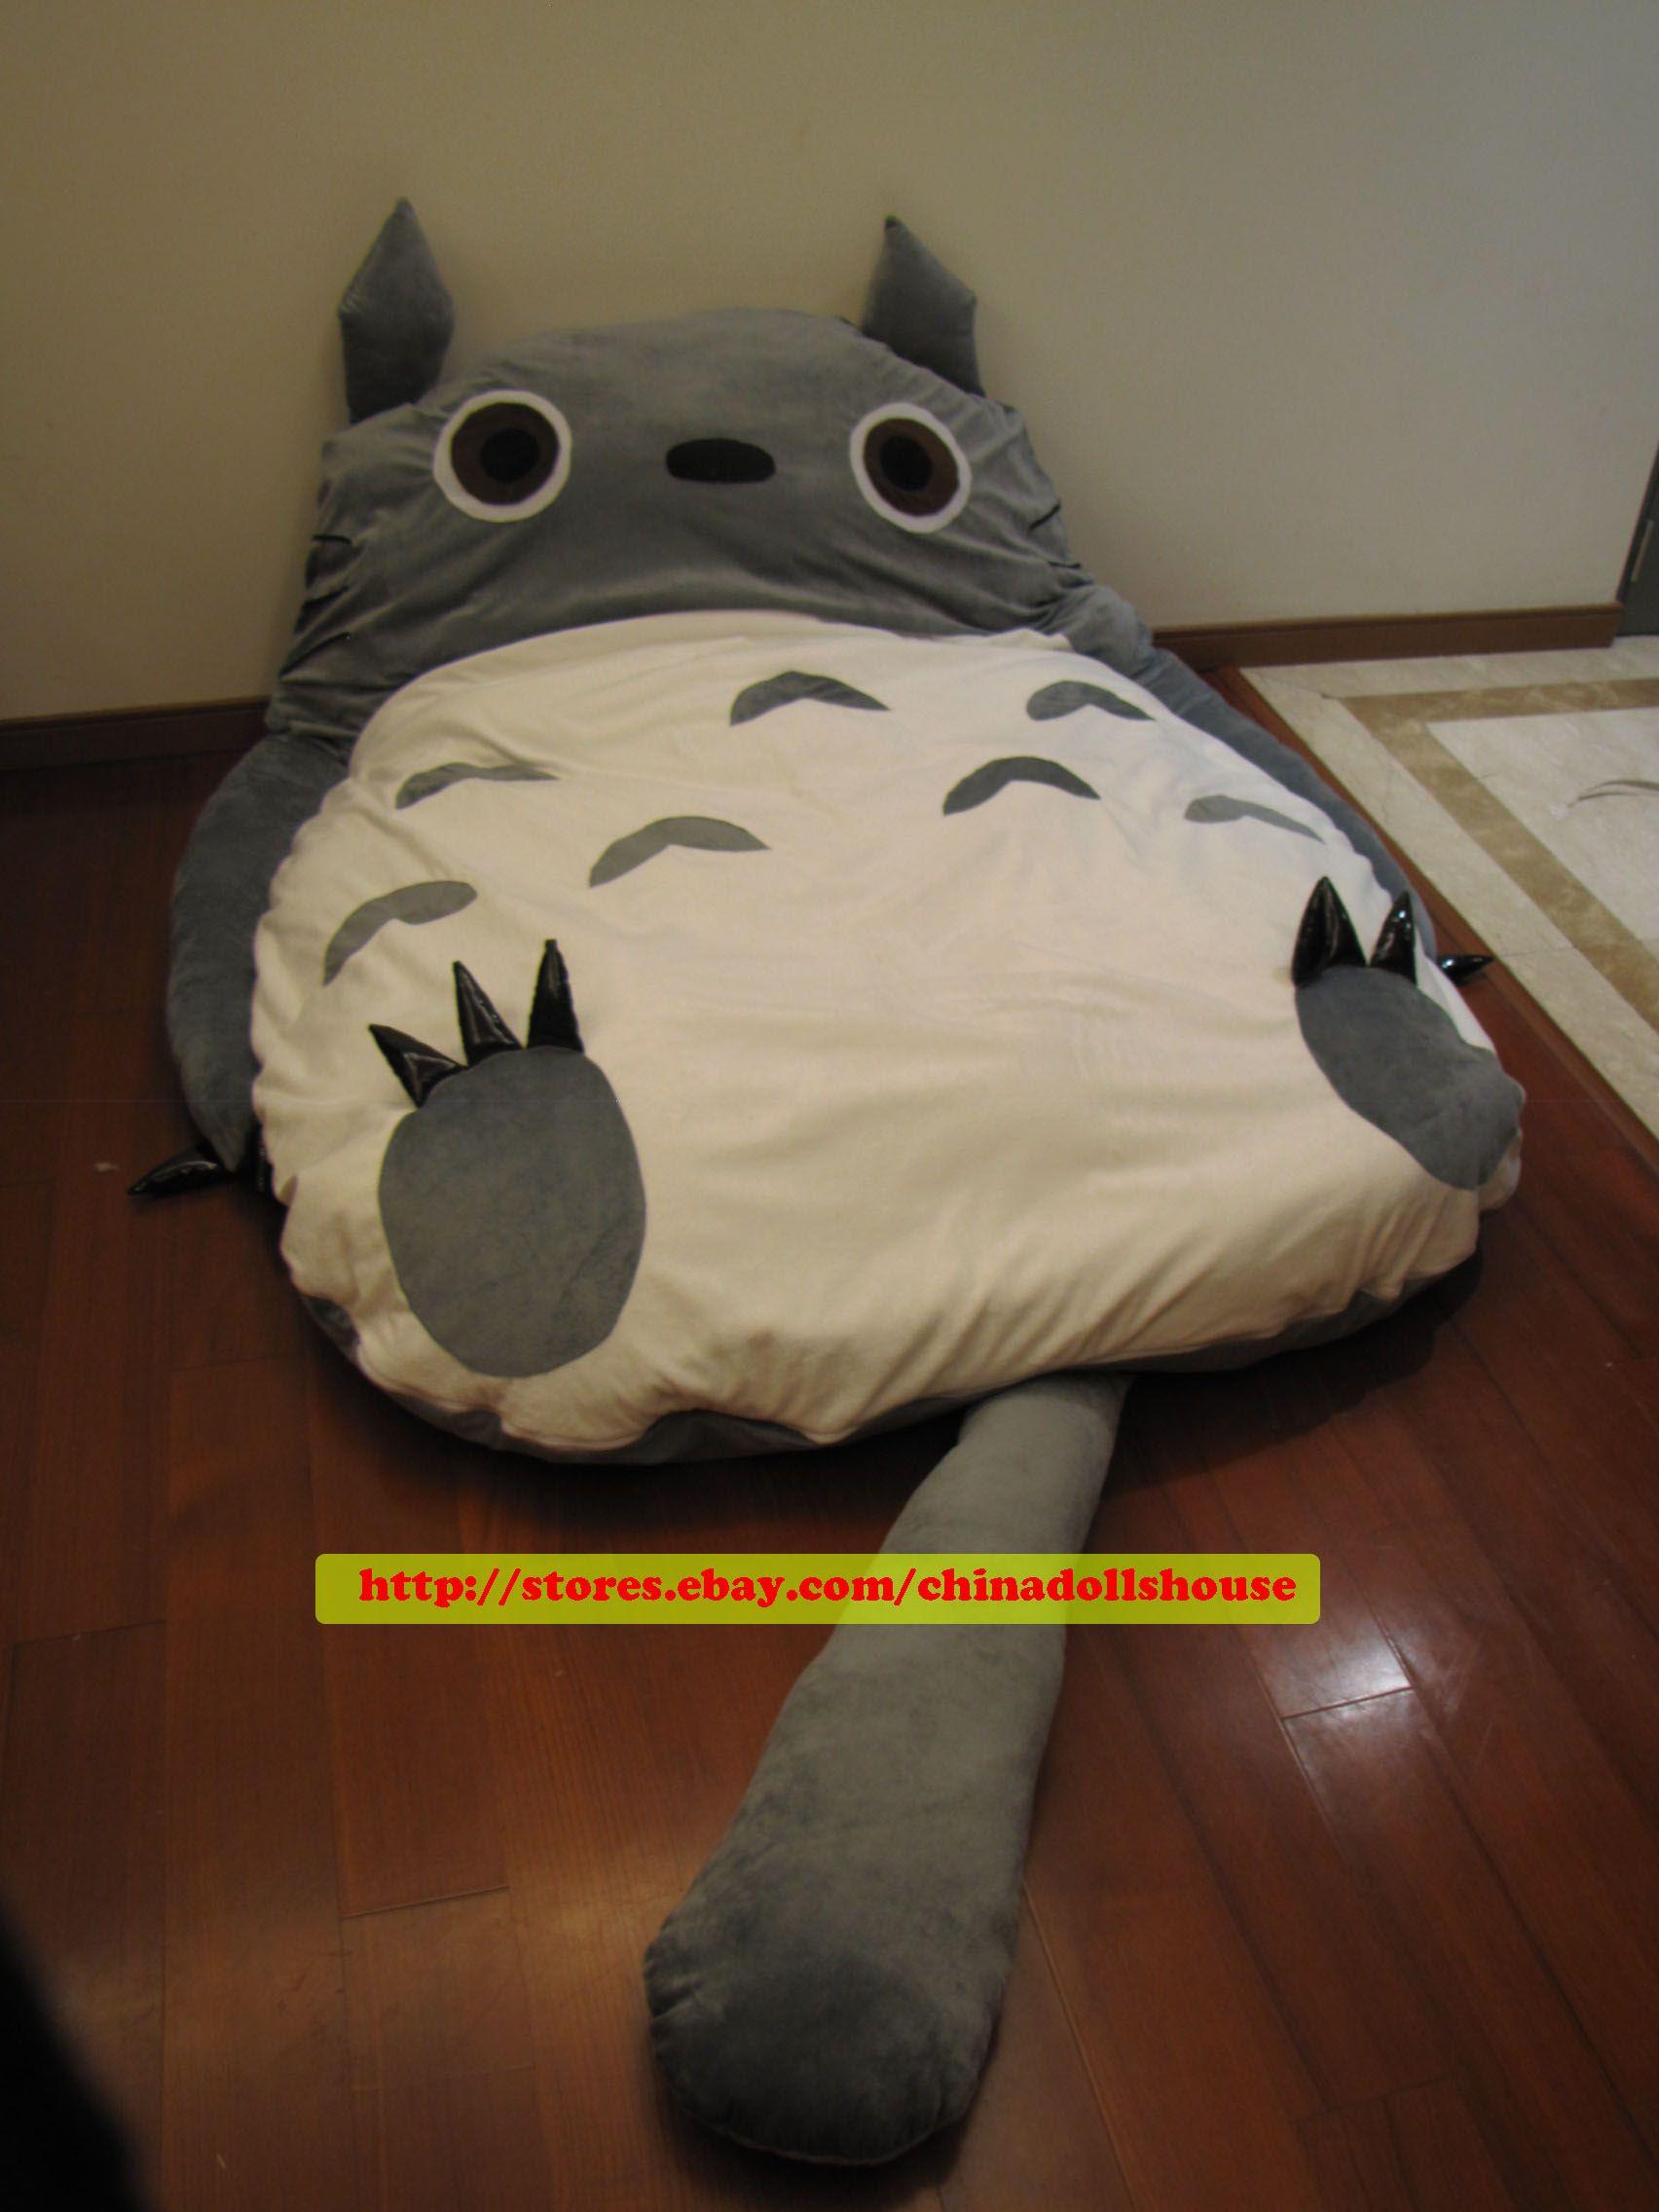 Big Huge Cute 2011 Models 220cm Totoro Bed Sleeping Bag Sofa Valentine's Day Gif | eBay